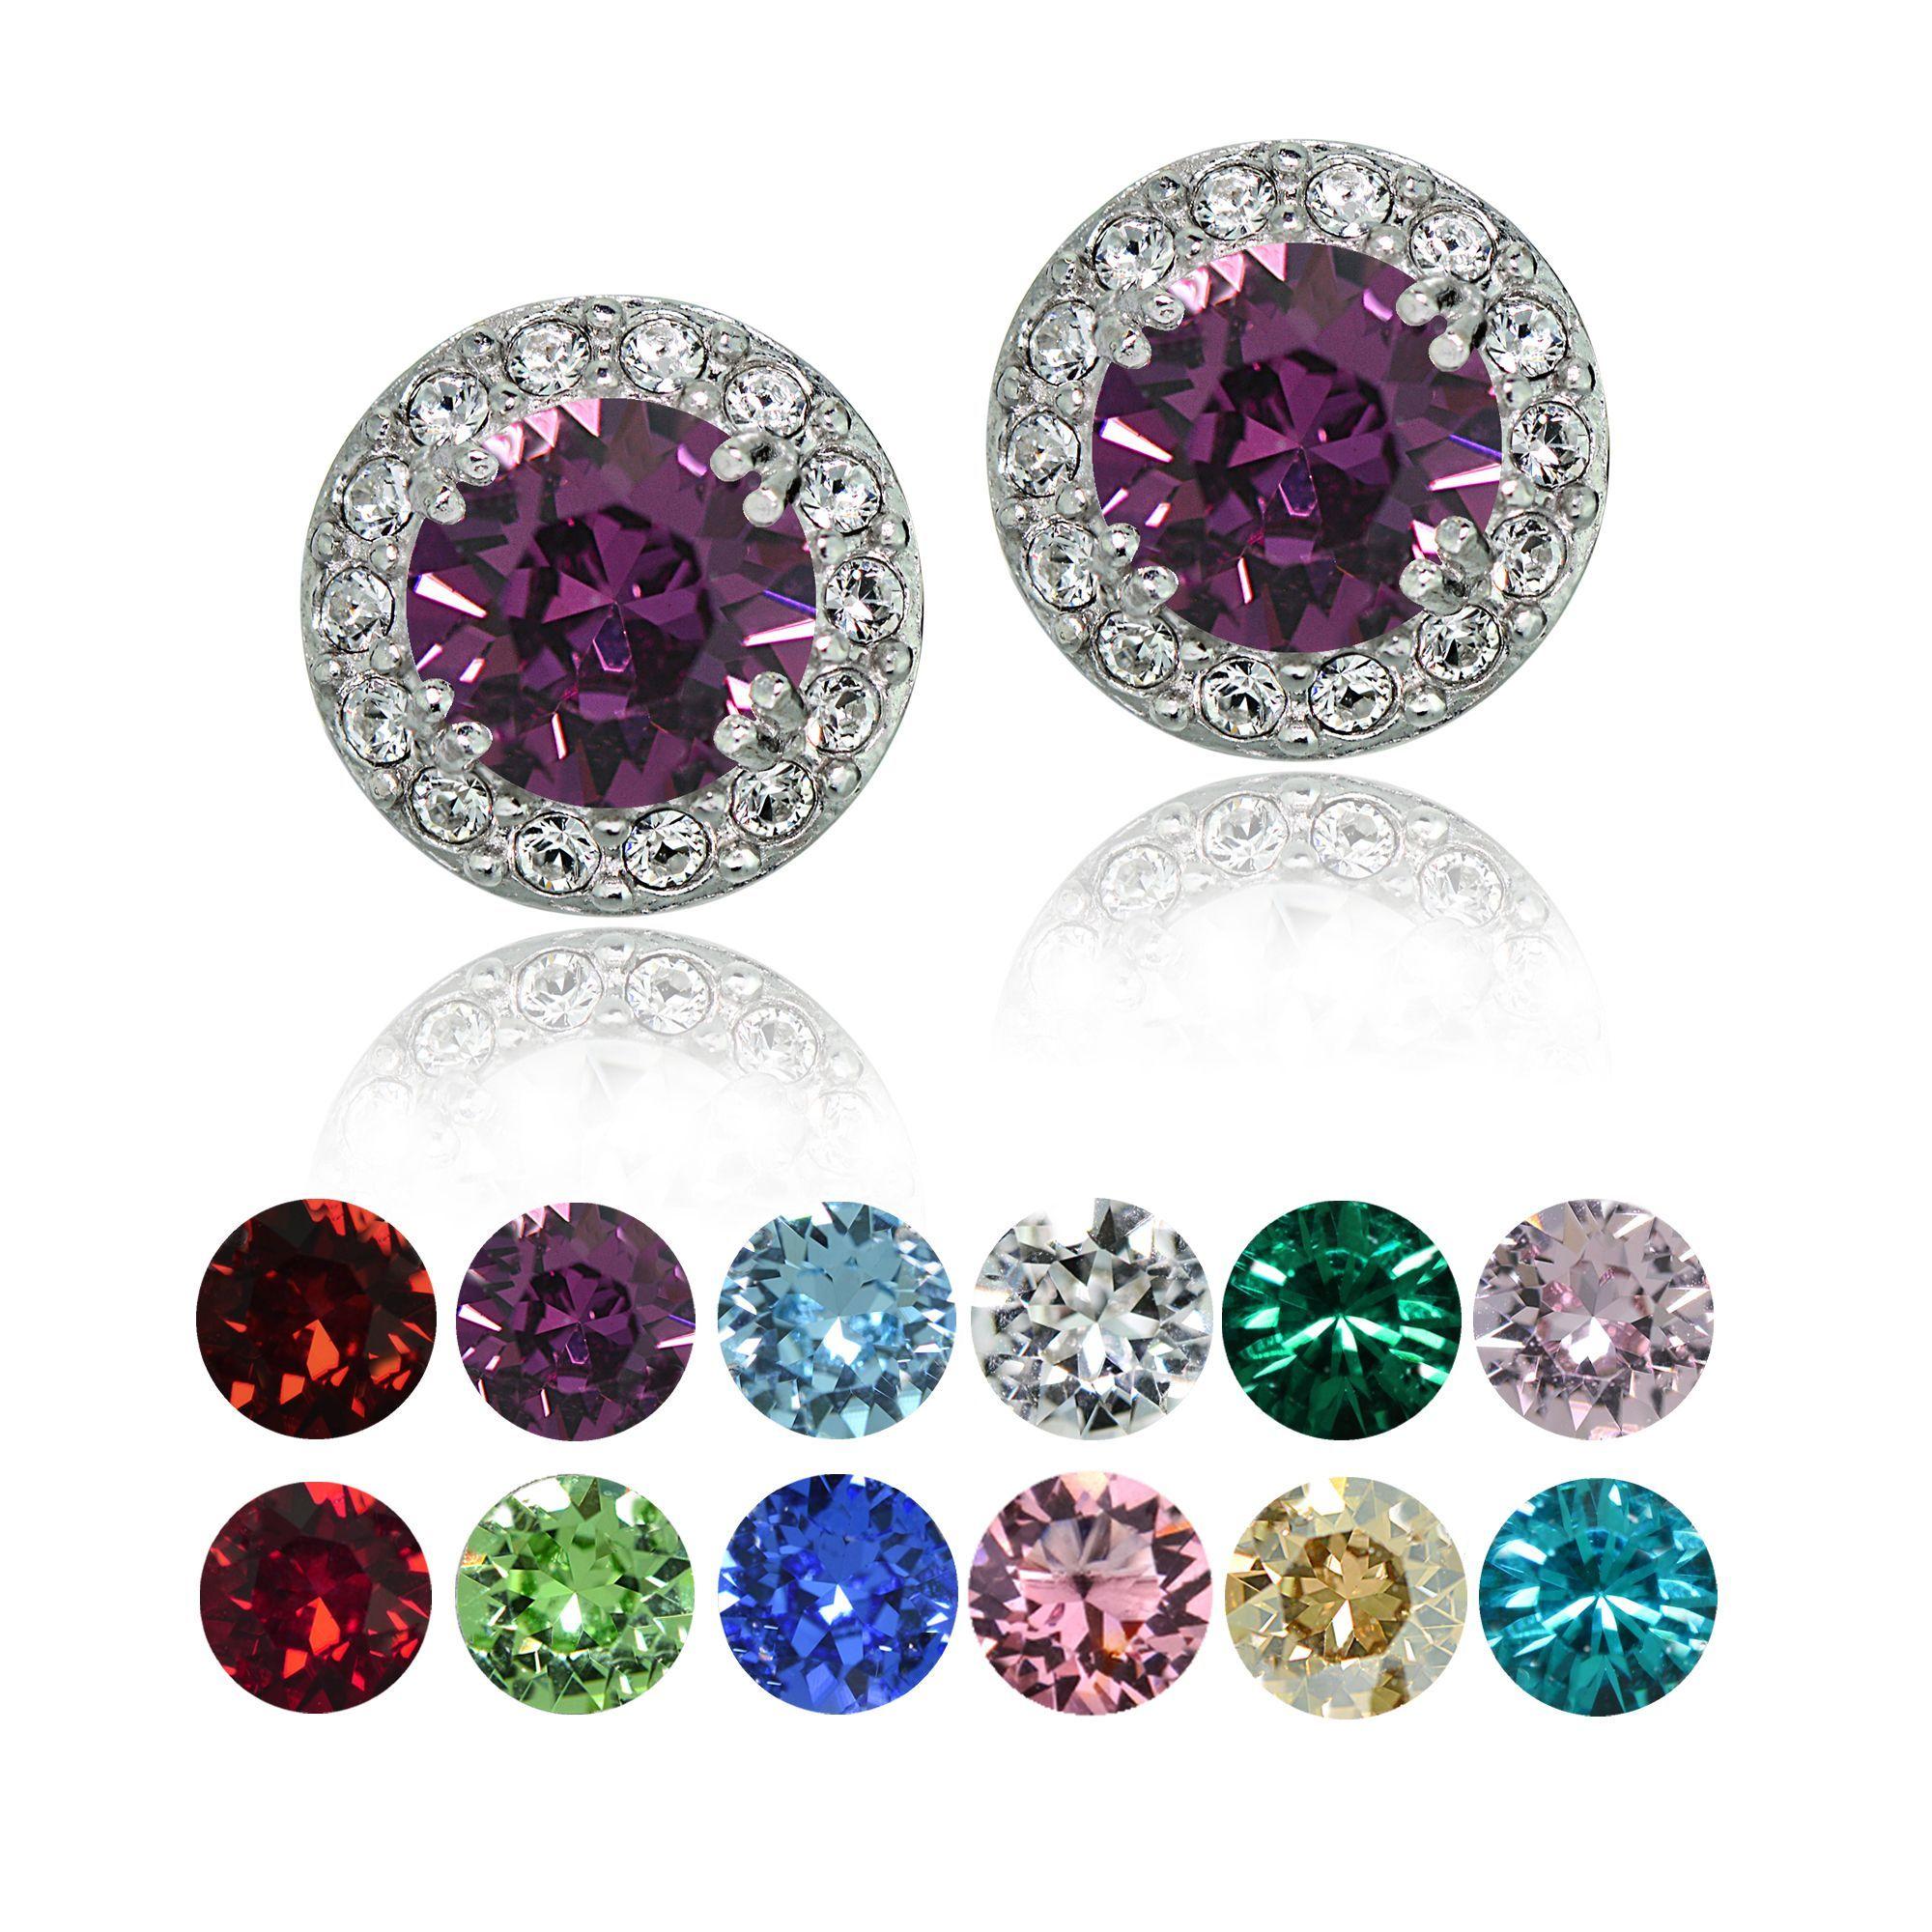 e1bae15ef397db Crystal Ice Sterling Silver Swarovski Elements Birthstone Halo Stud Earrings  (August - Peridot)